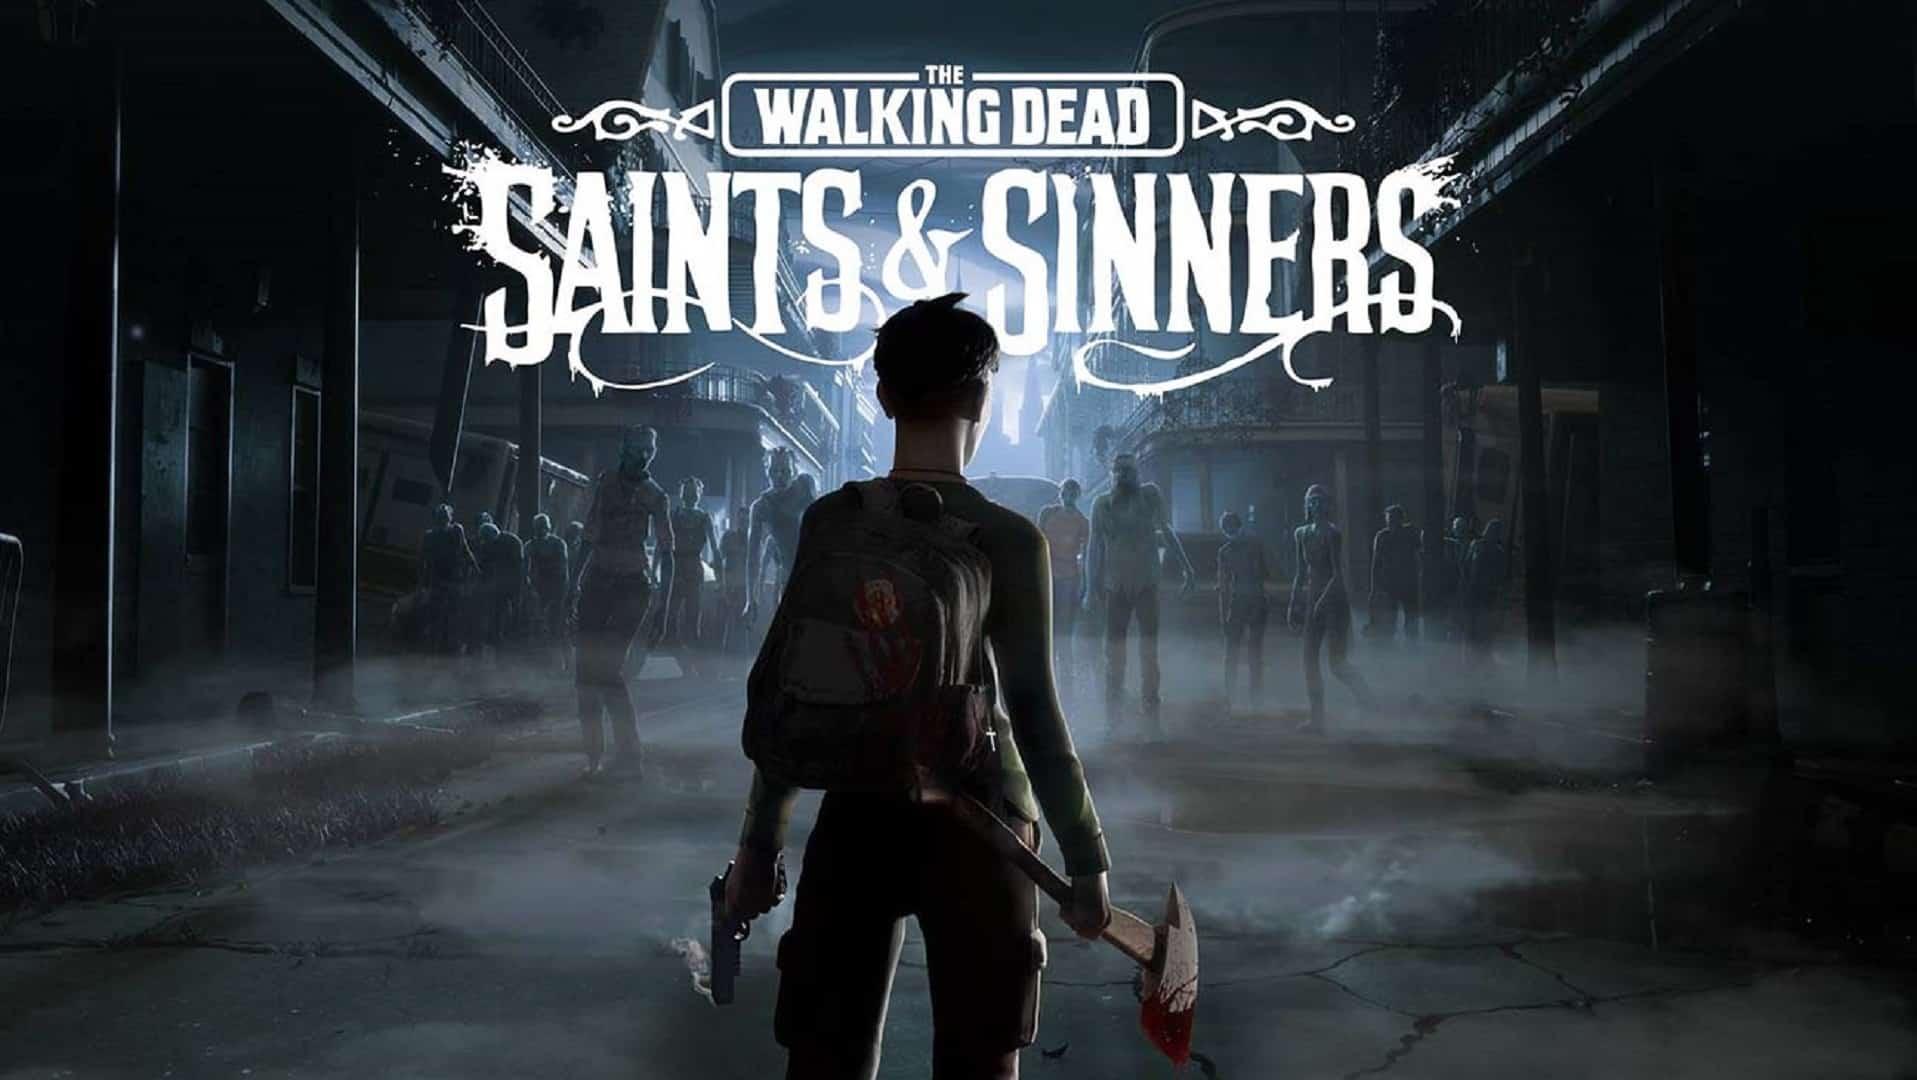 The Walking Dead Saints & Sinners Skybound Interactive